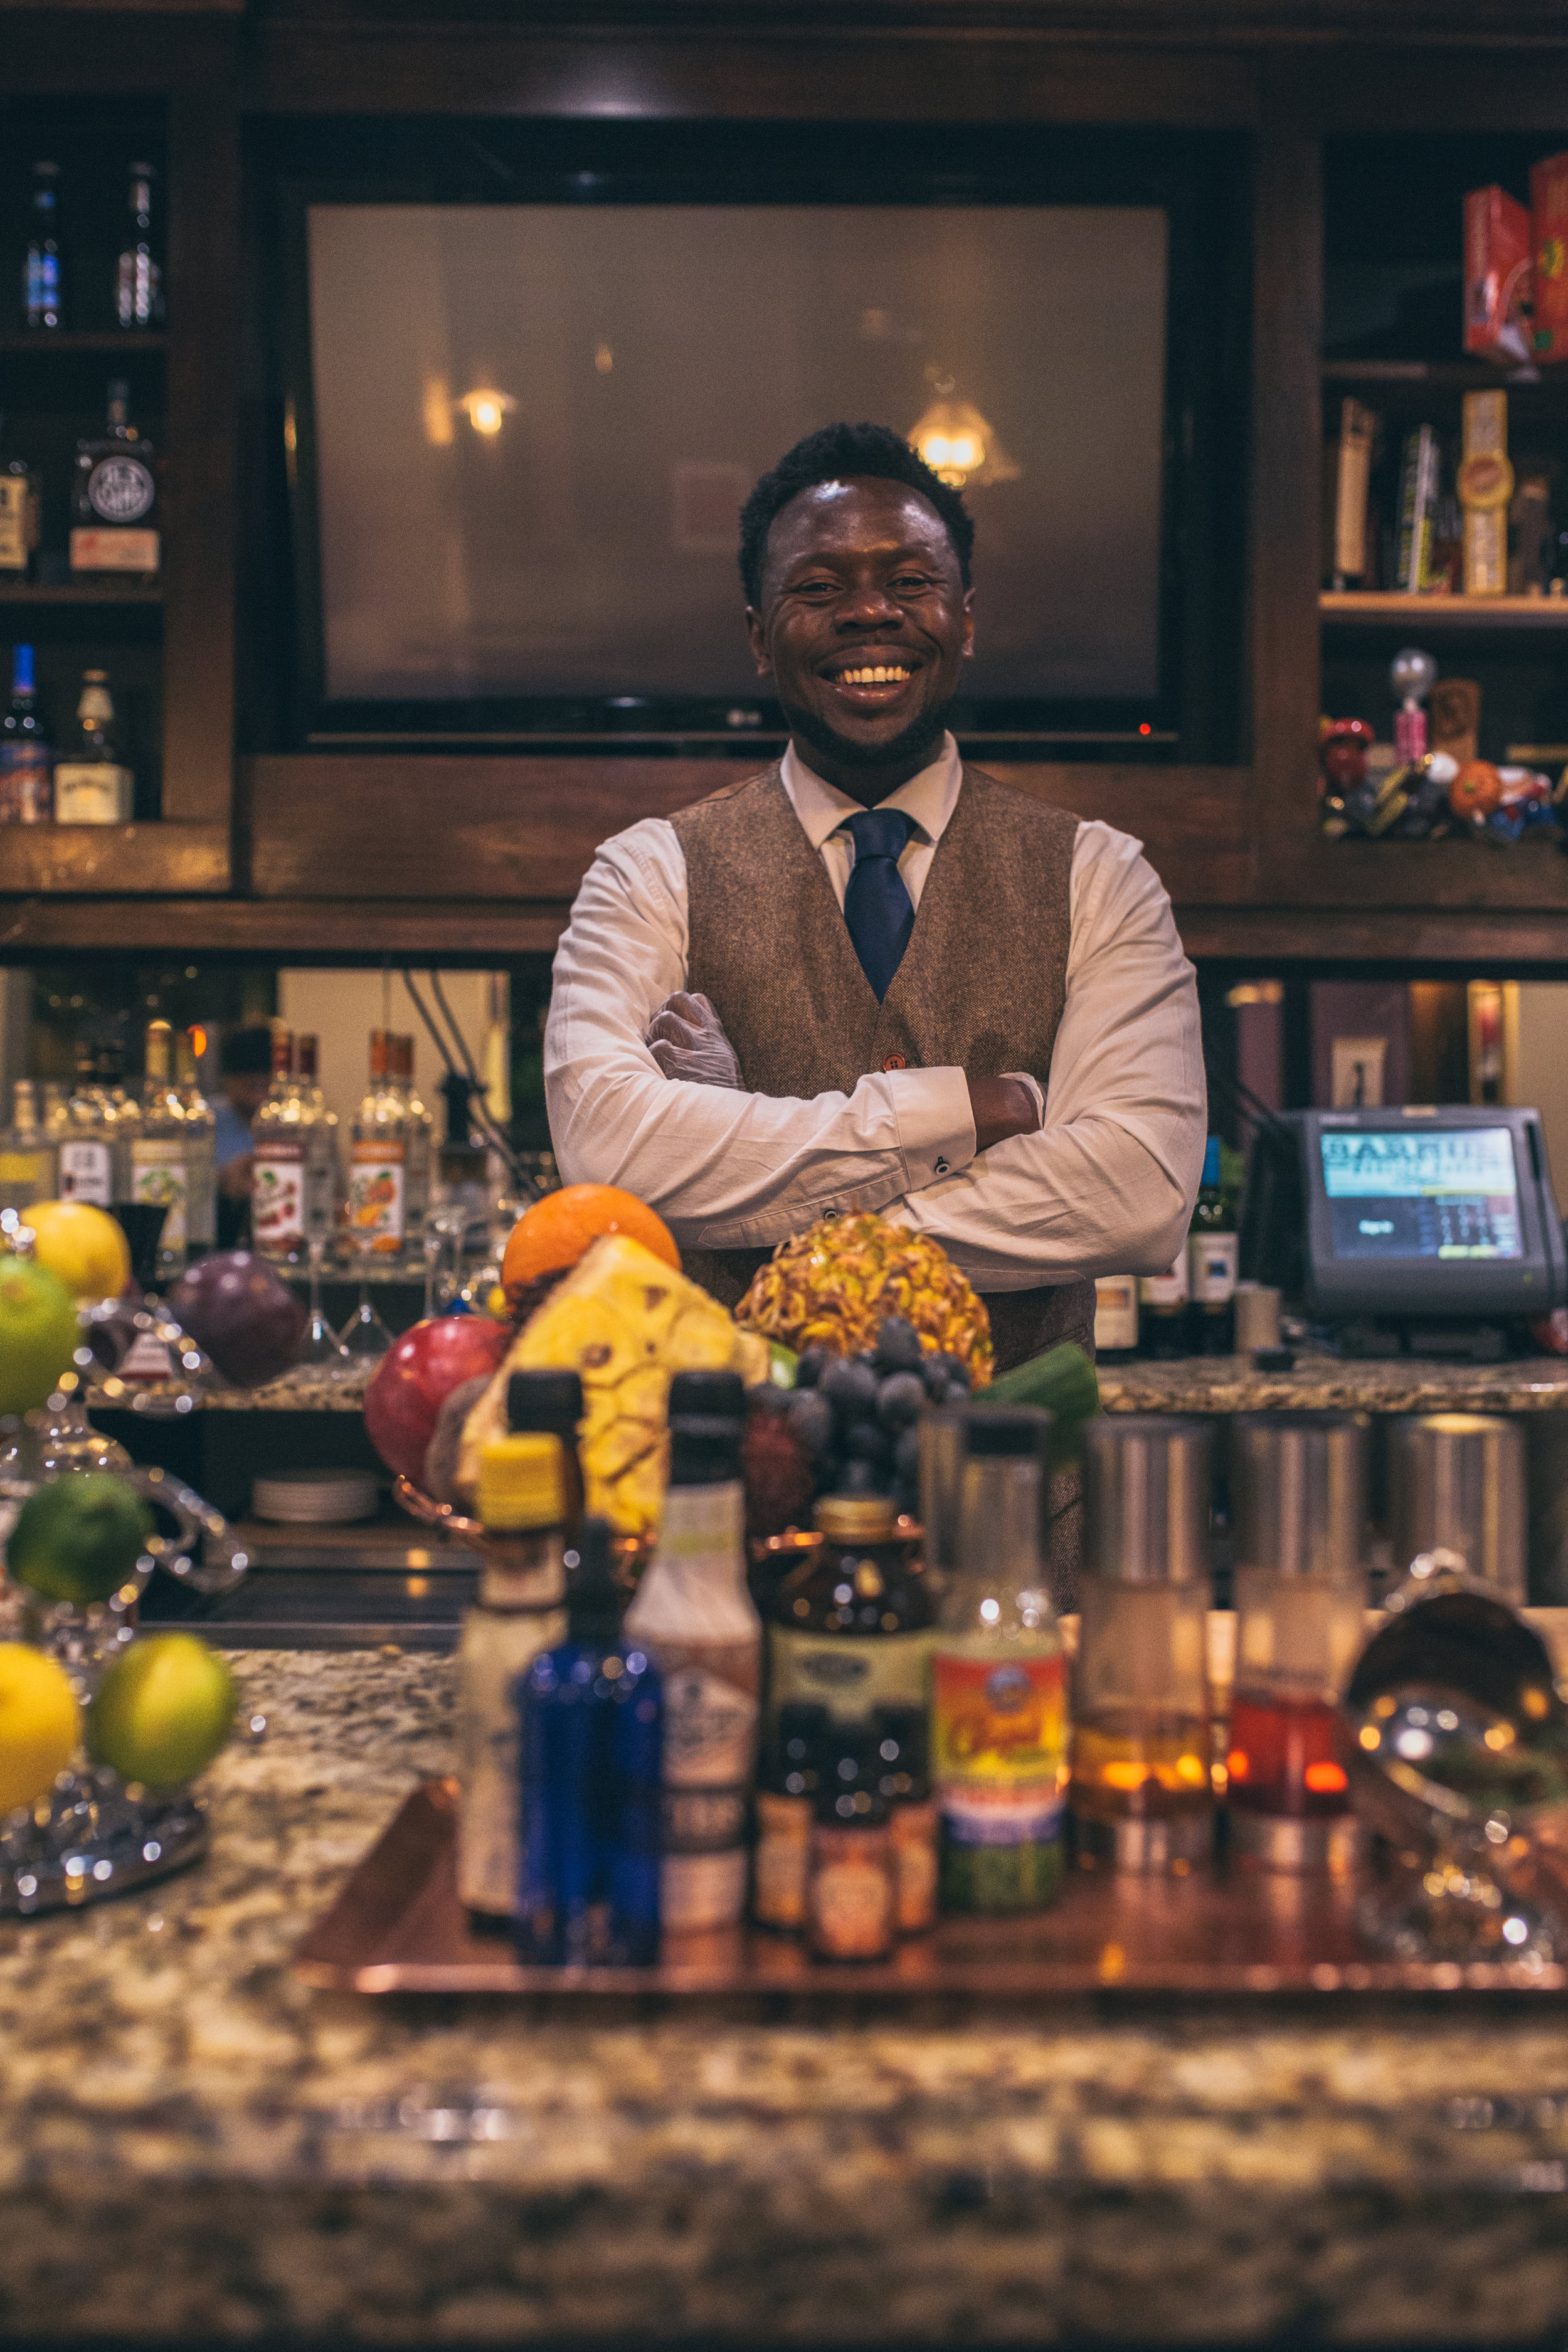 BootlegGreg Cocktail